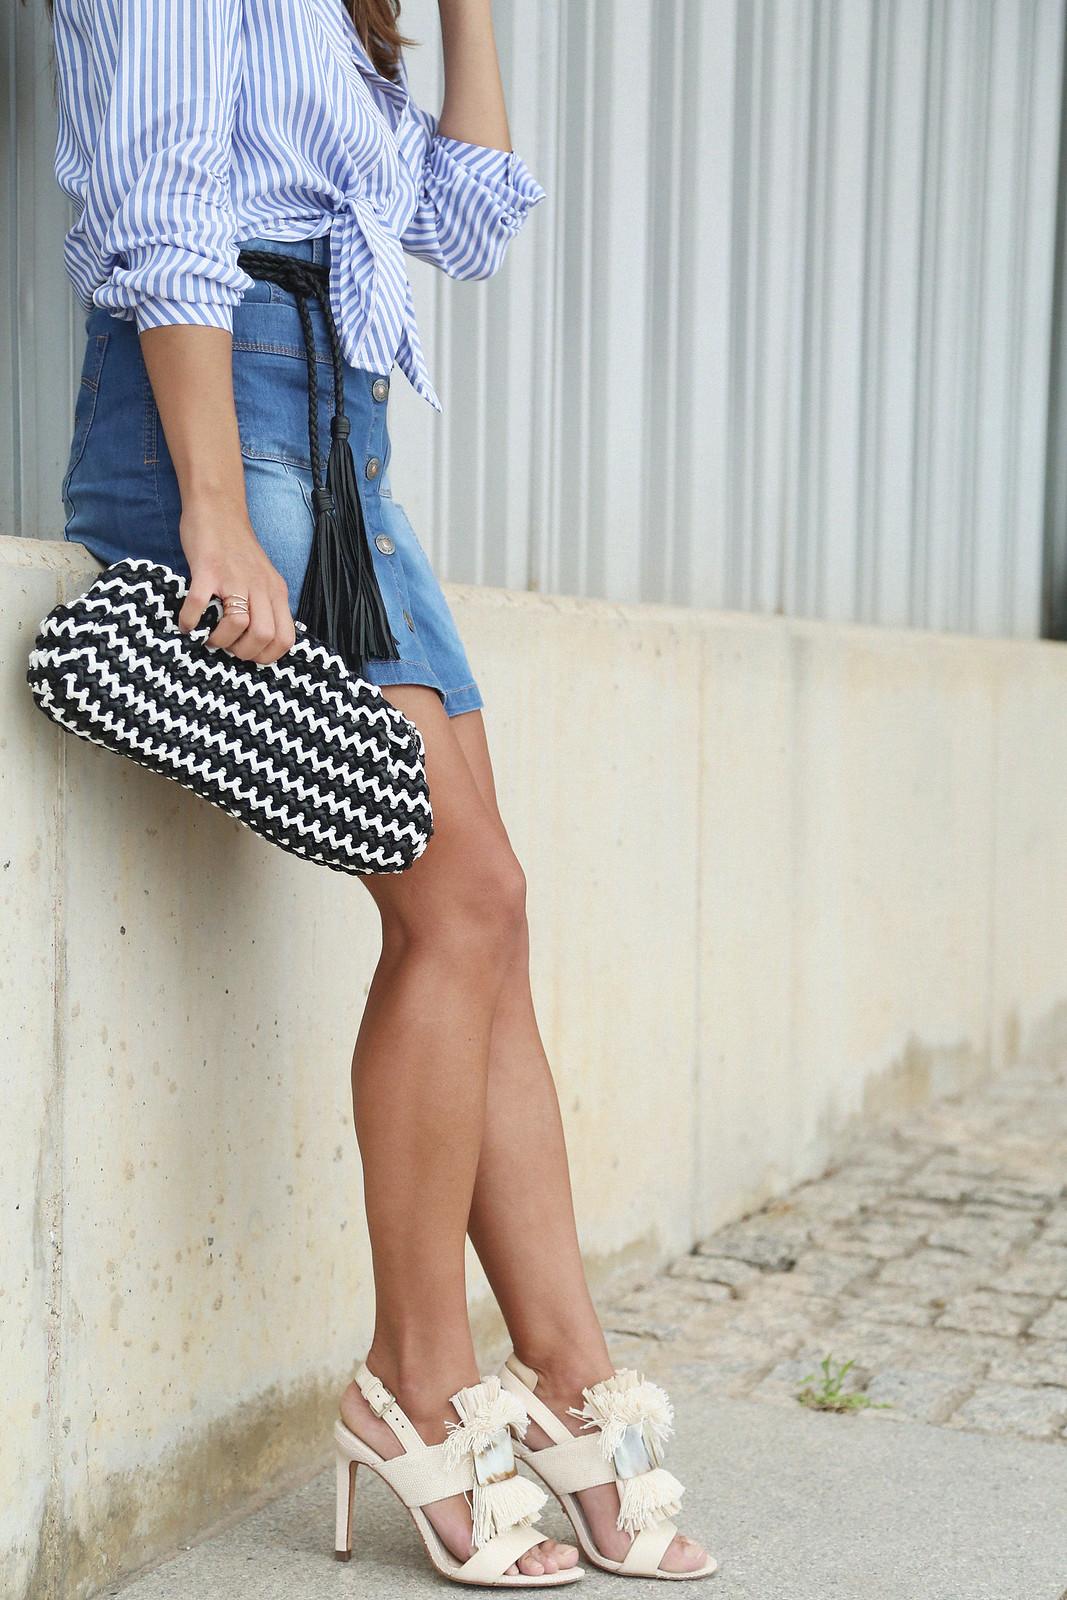 jessie chanes seams for a desire denim skirt stripes shirt-14